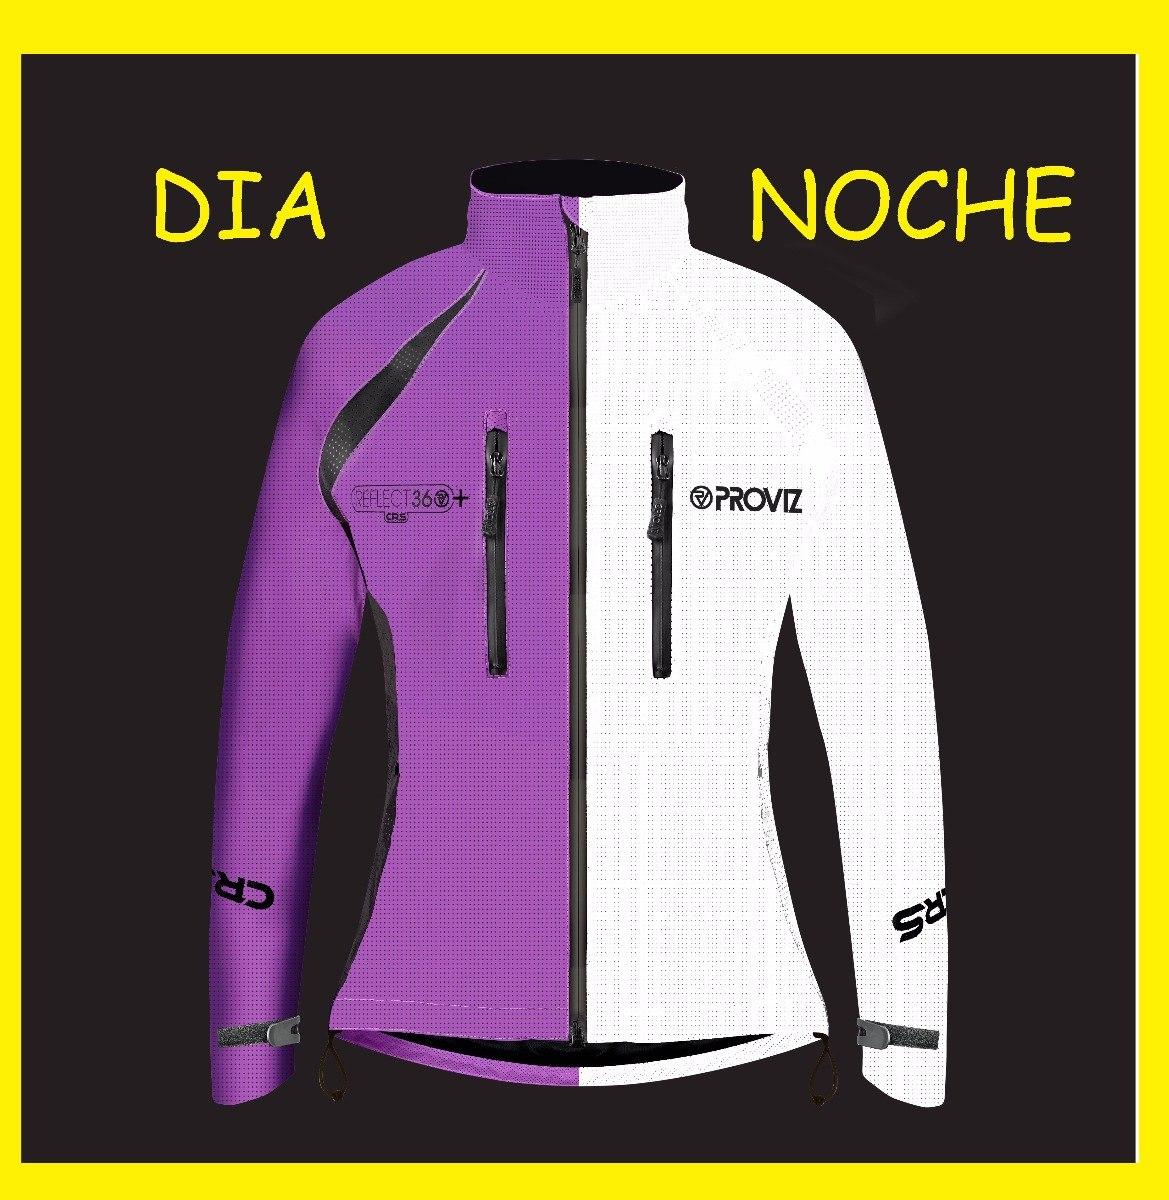 b2f0738348b chaqueta reflectiva impermeable moto proviz 360 crs+ mujer. Cargando zoom.